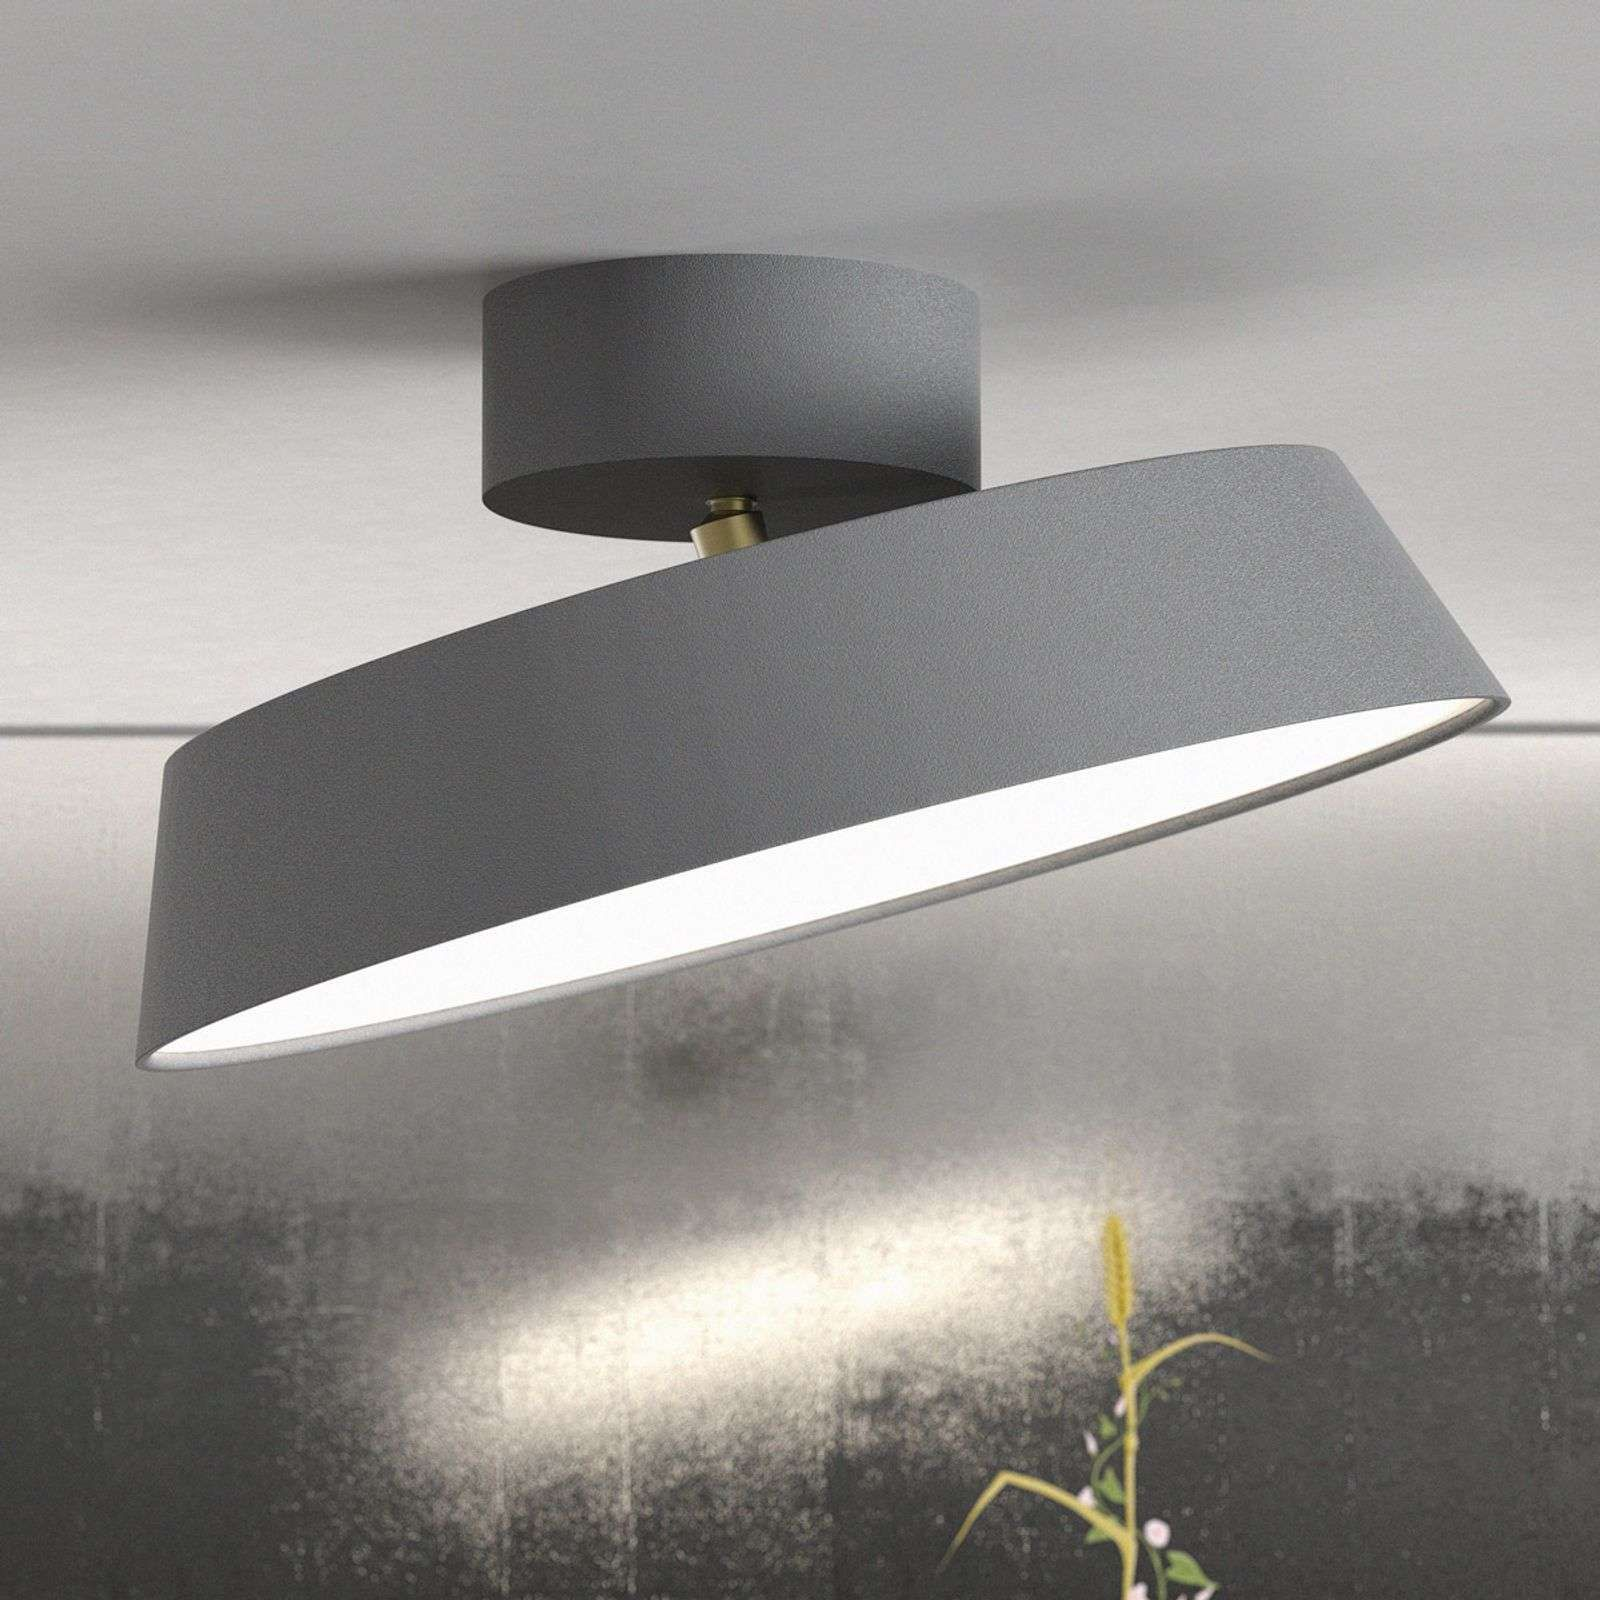 Led Plafondlamp Alba Zwenkbaar Grijs Dimbaar Van Nordlux Plafondlamp Plafondverlichting Led